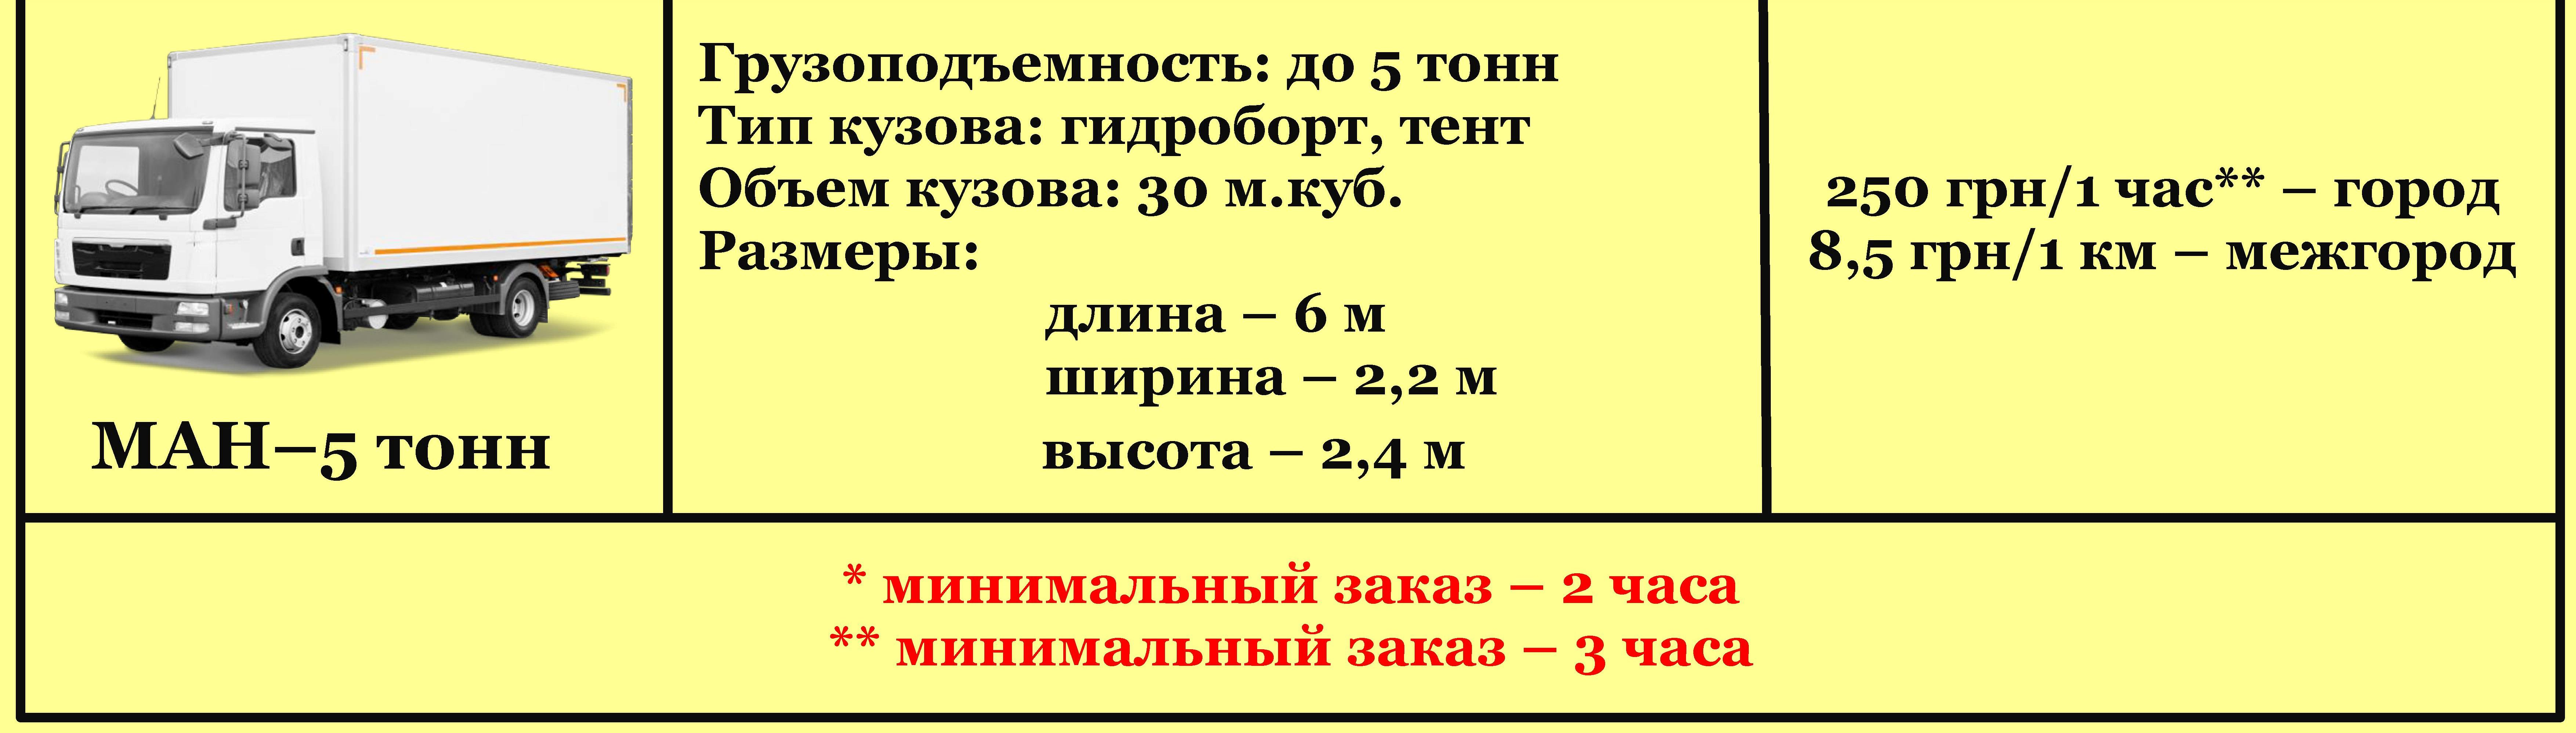 ТРАНСПОРТ4